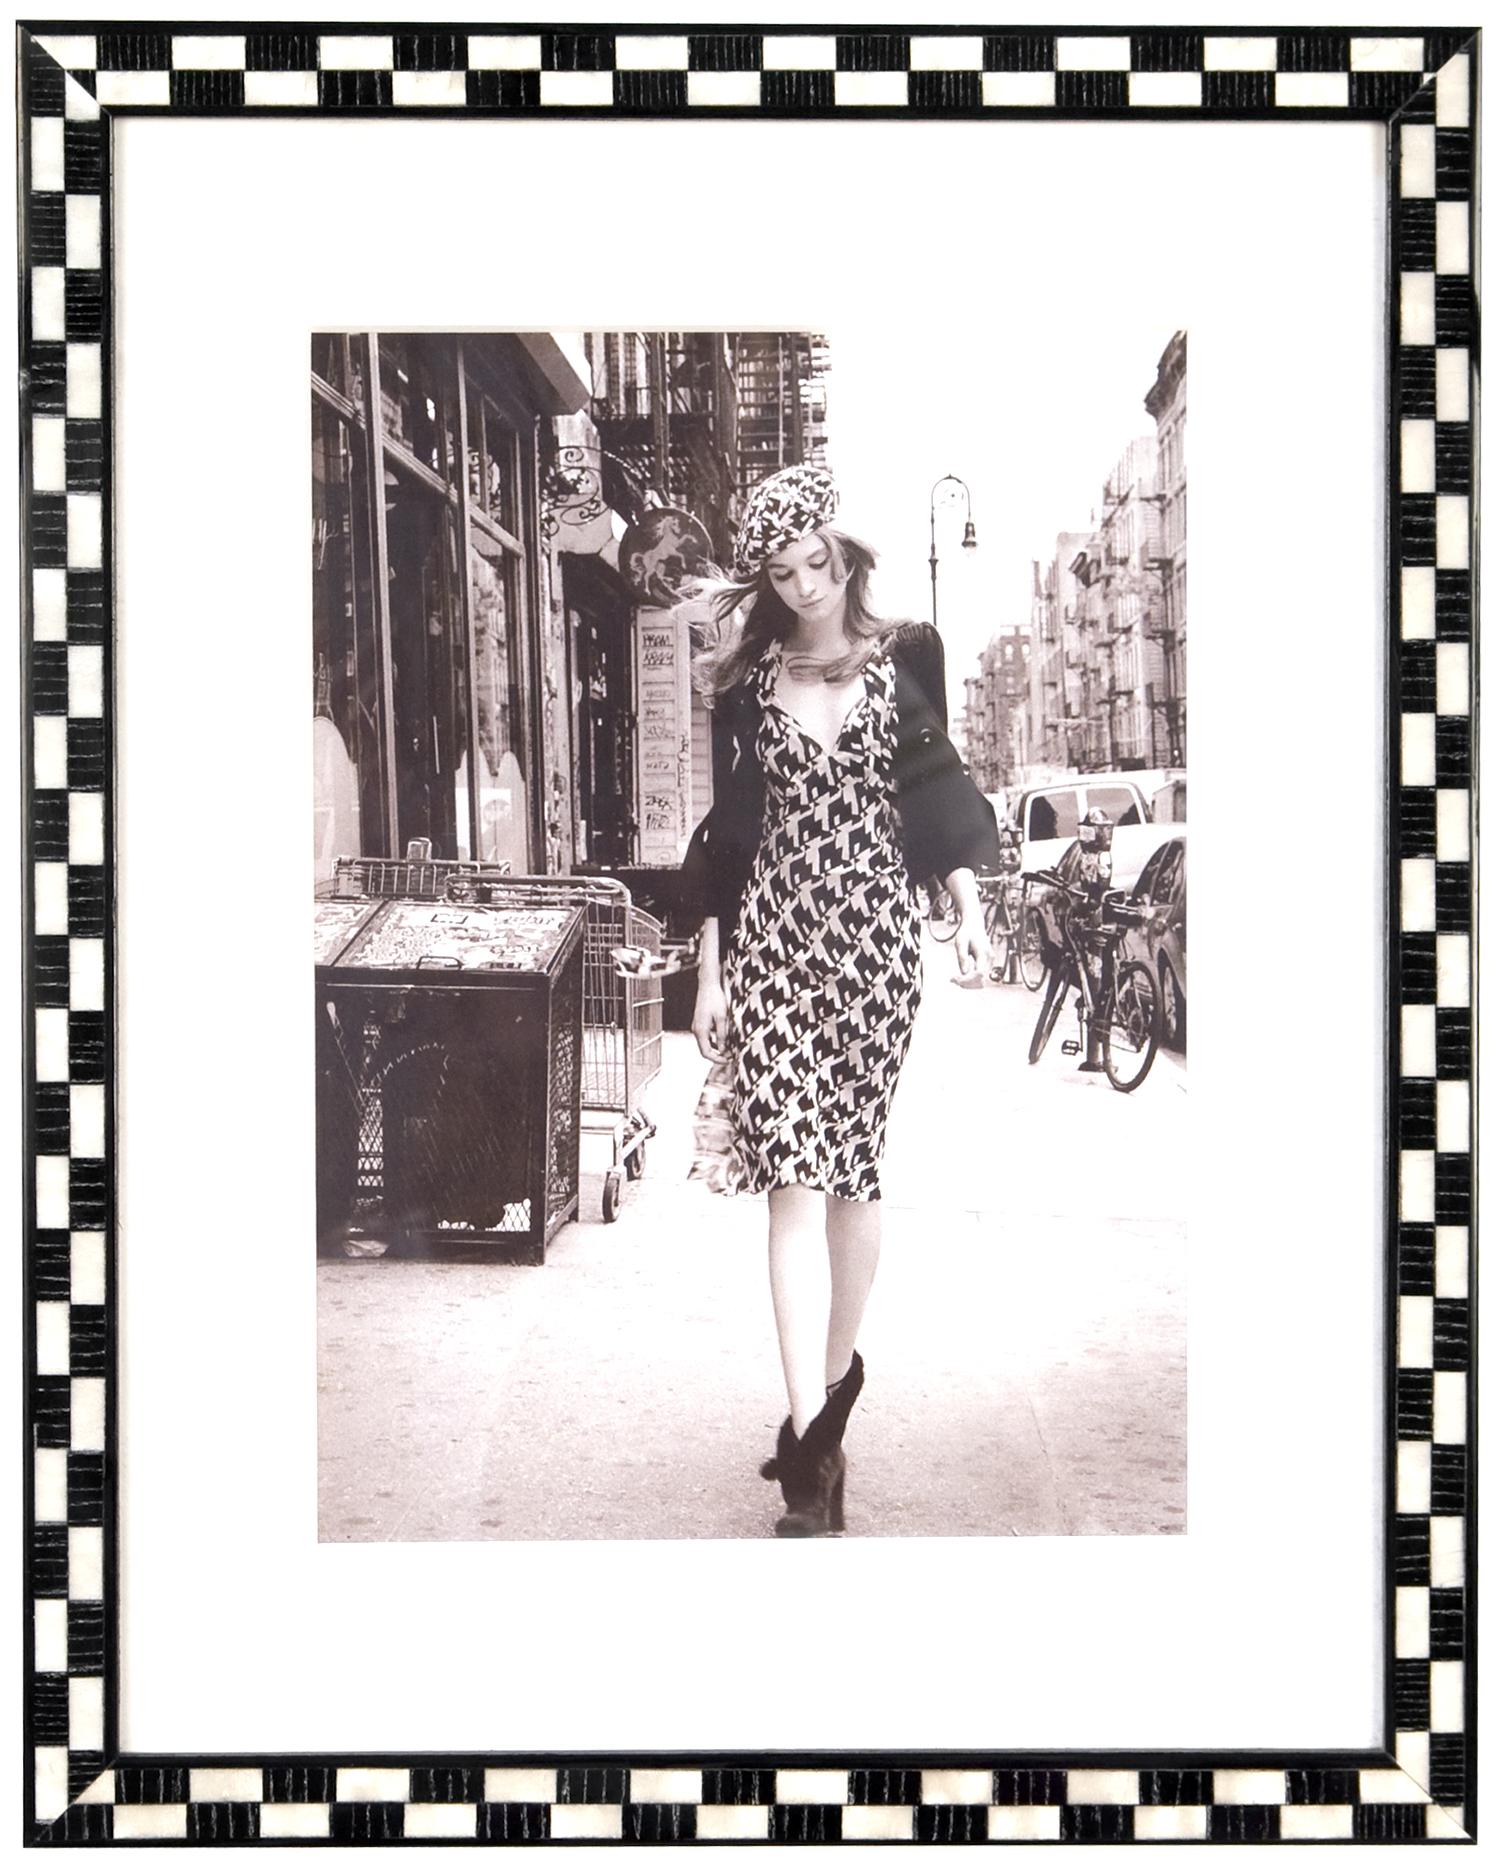 Jazzy Black and White Photo